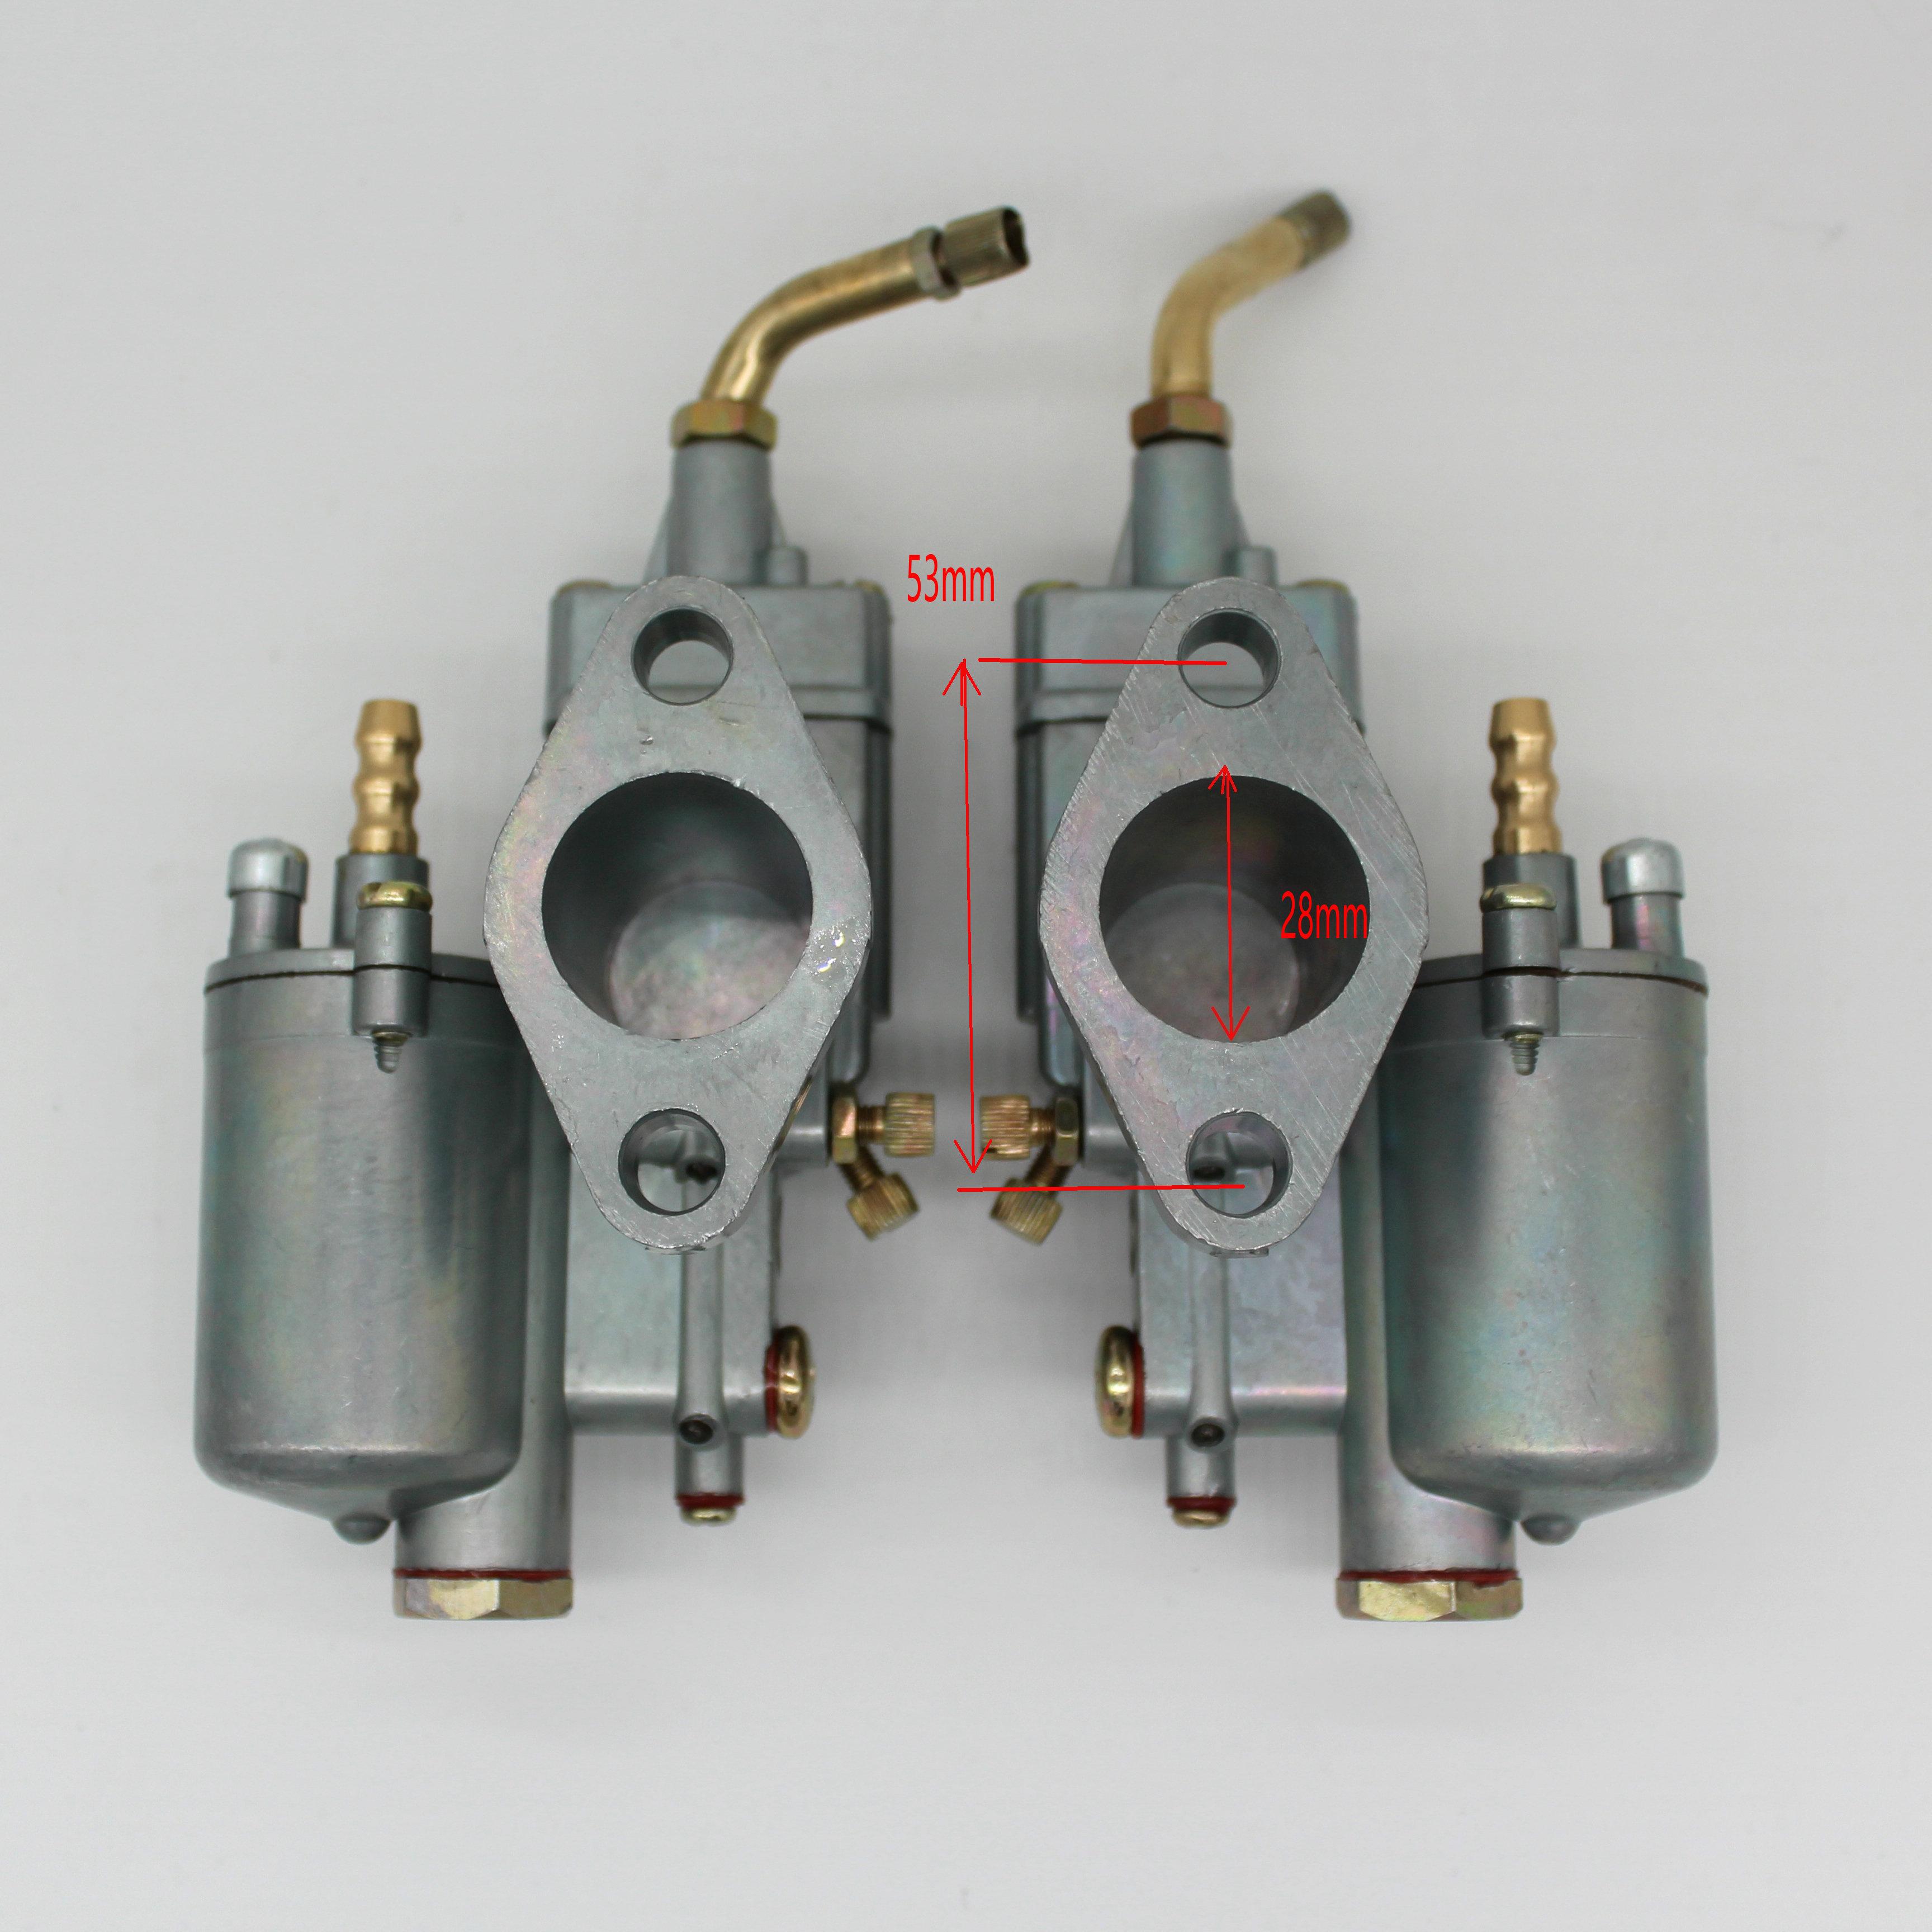 High Performance 1 pair Left Right 28mm Carb Pair Vergaser Carburetor Carb y fit for K302